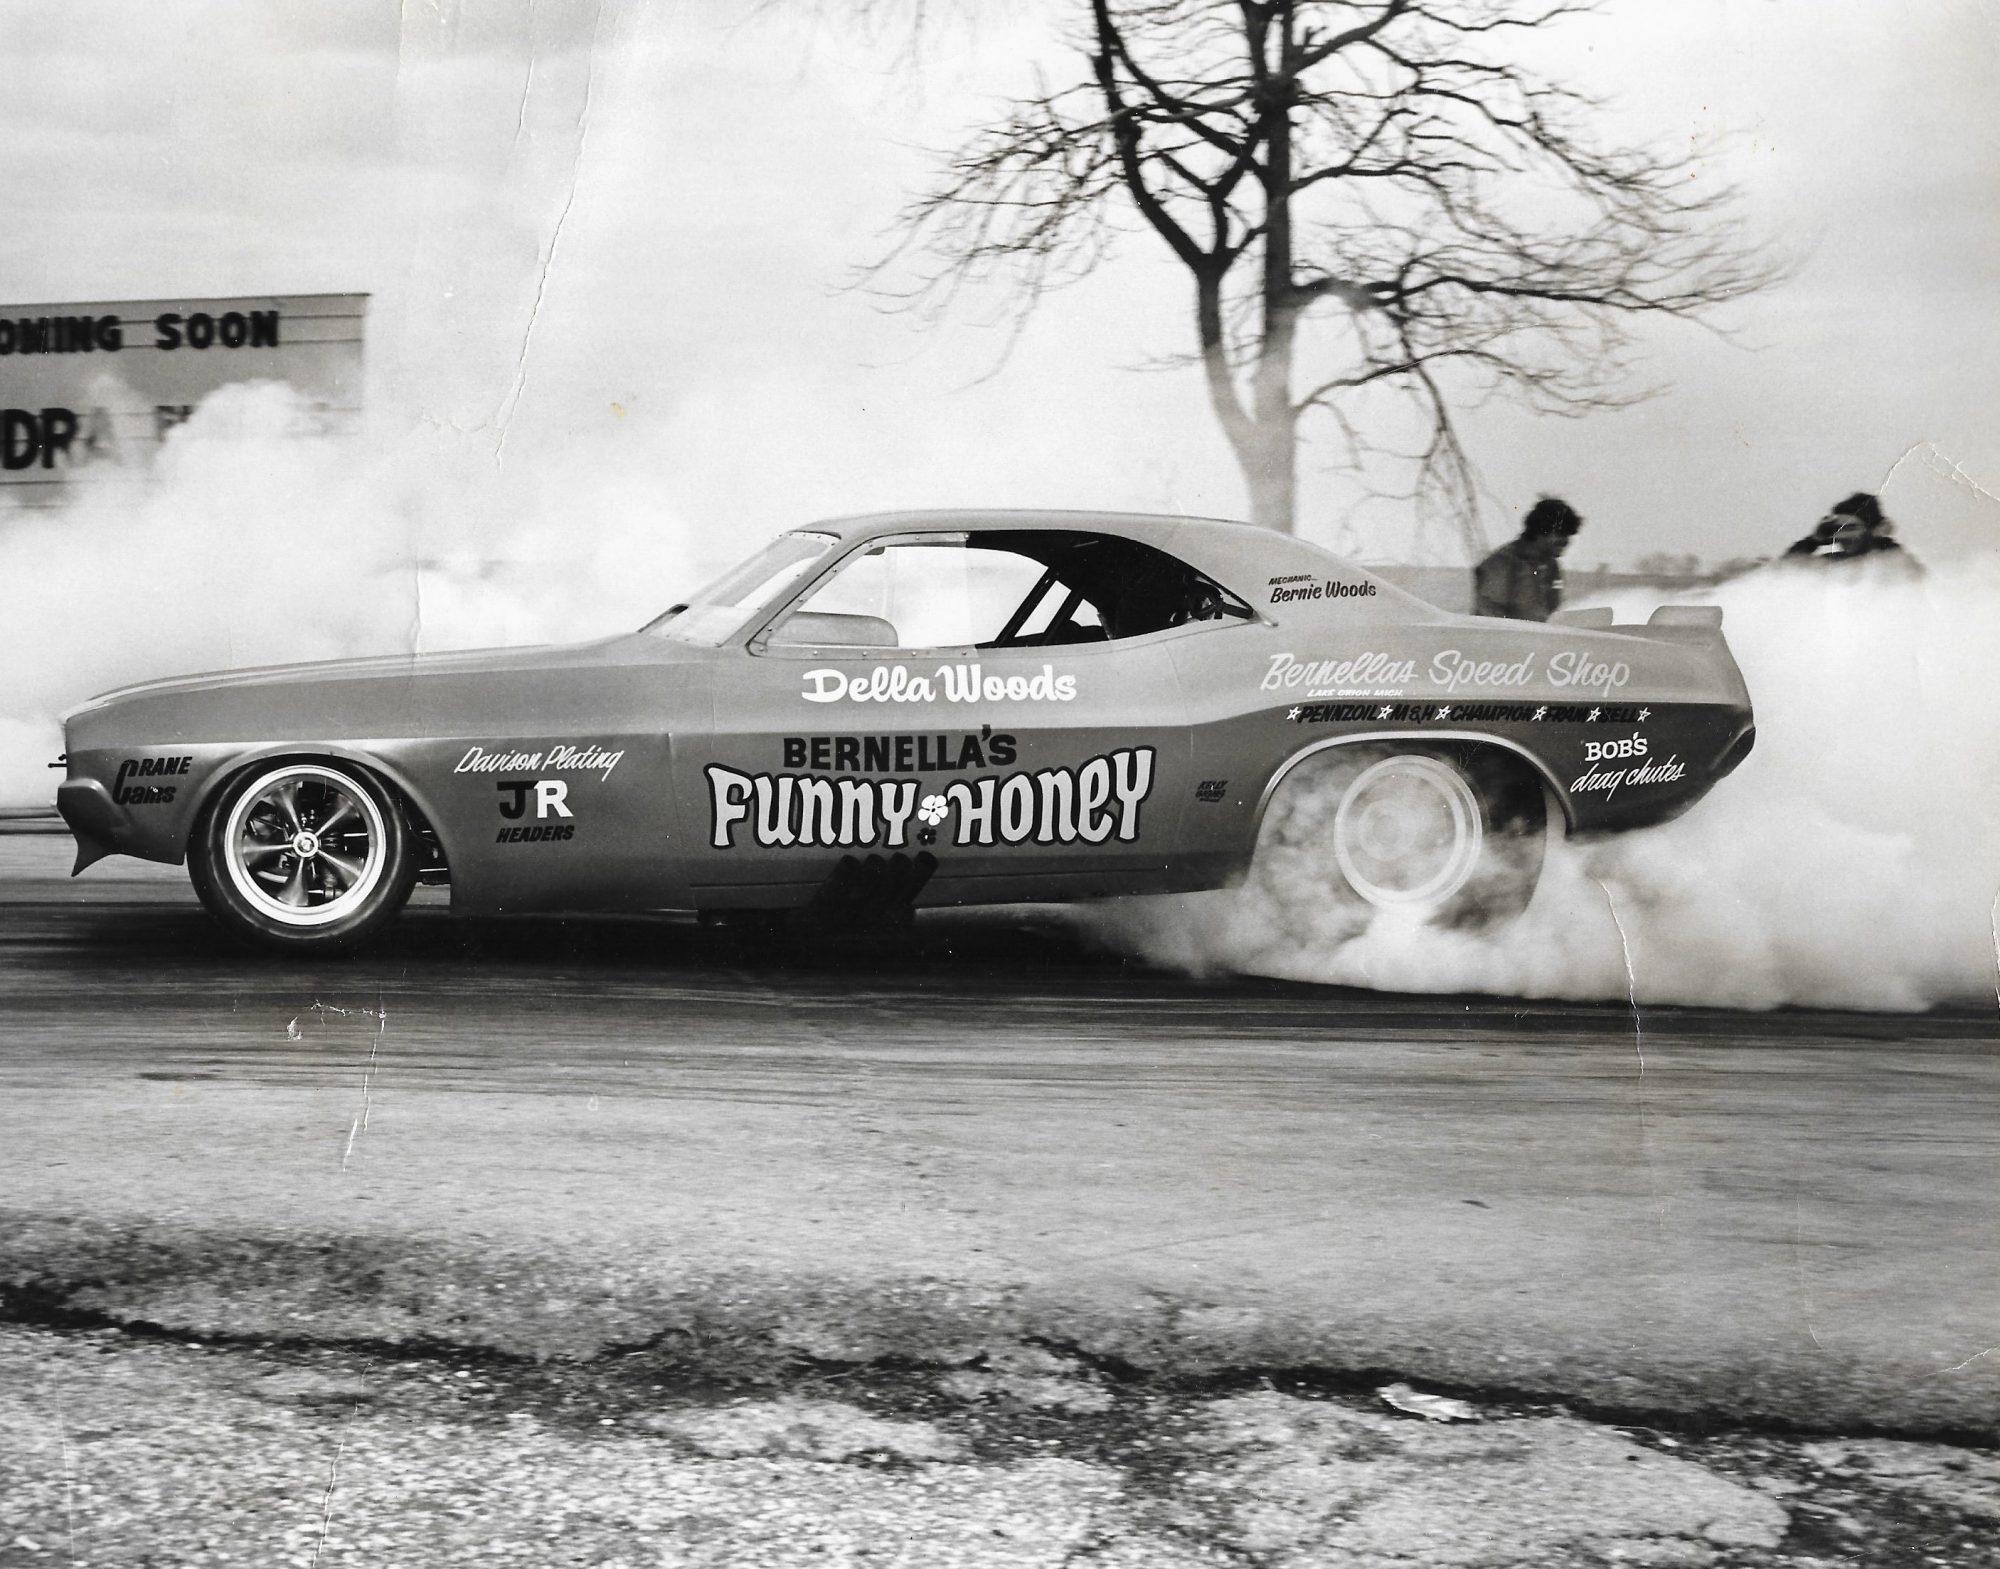 Della Woods car doing a burnout